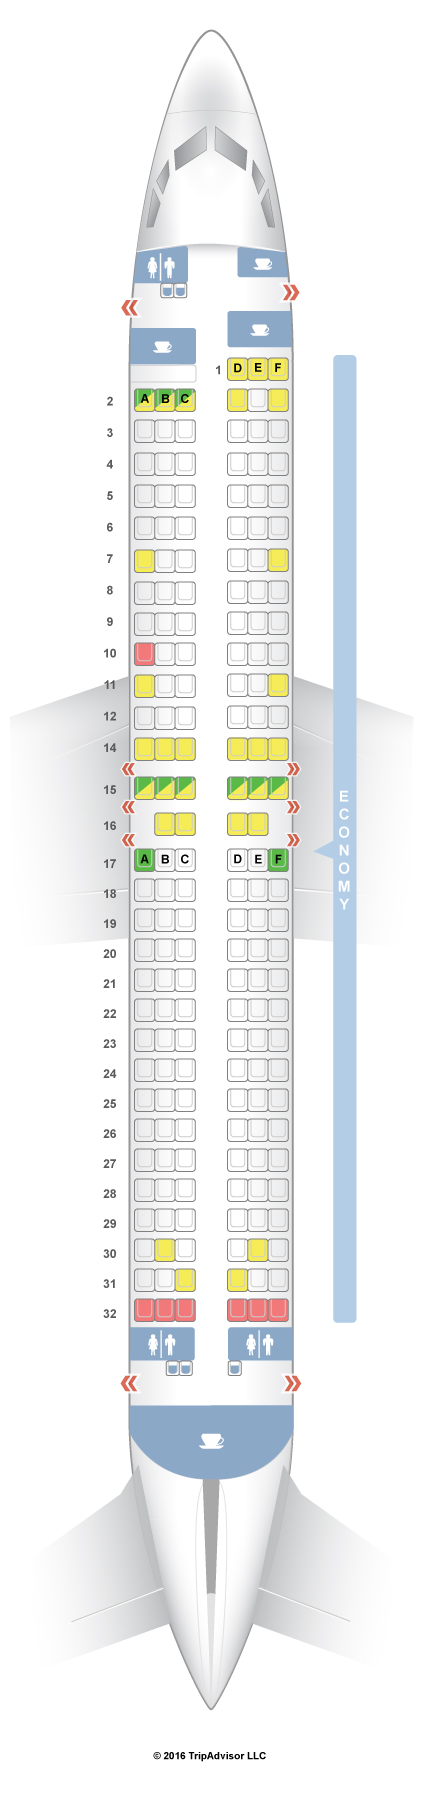 Seatguru Seat Map Sas Seatguru